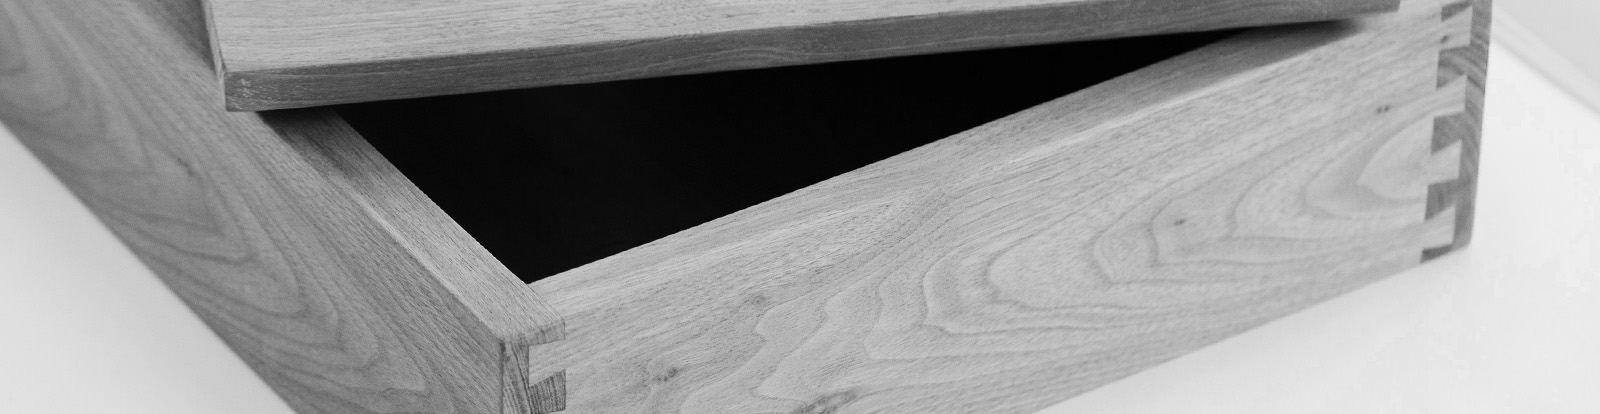 Handmade Wooden Album Box